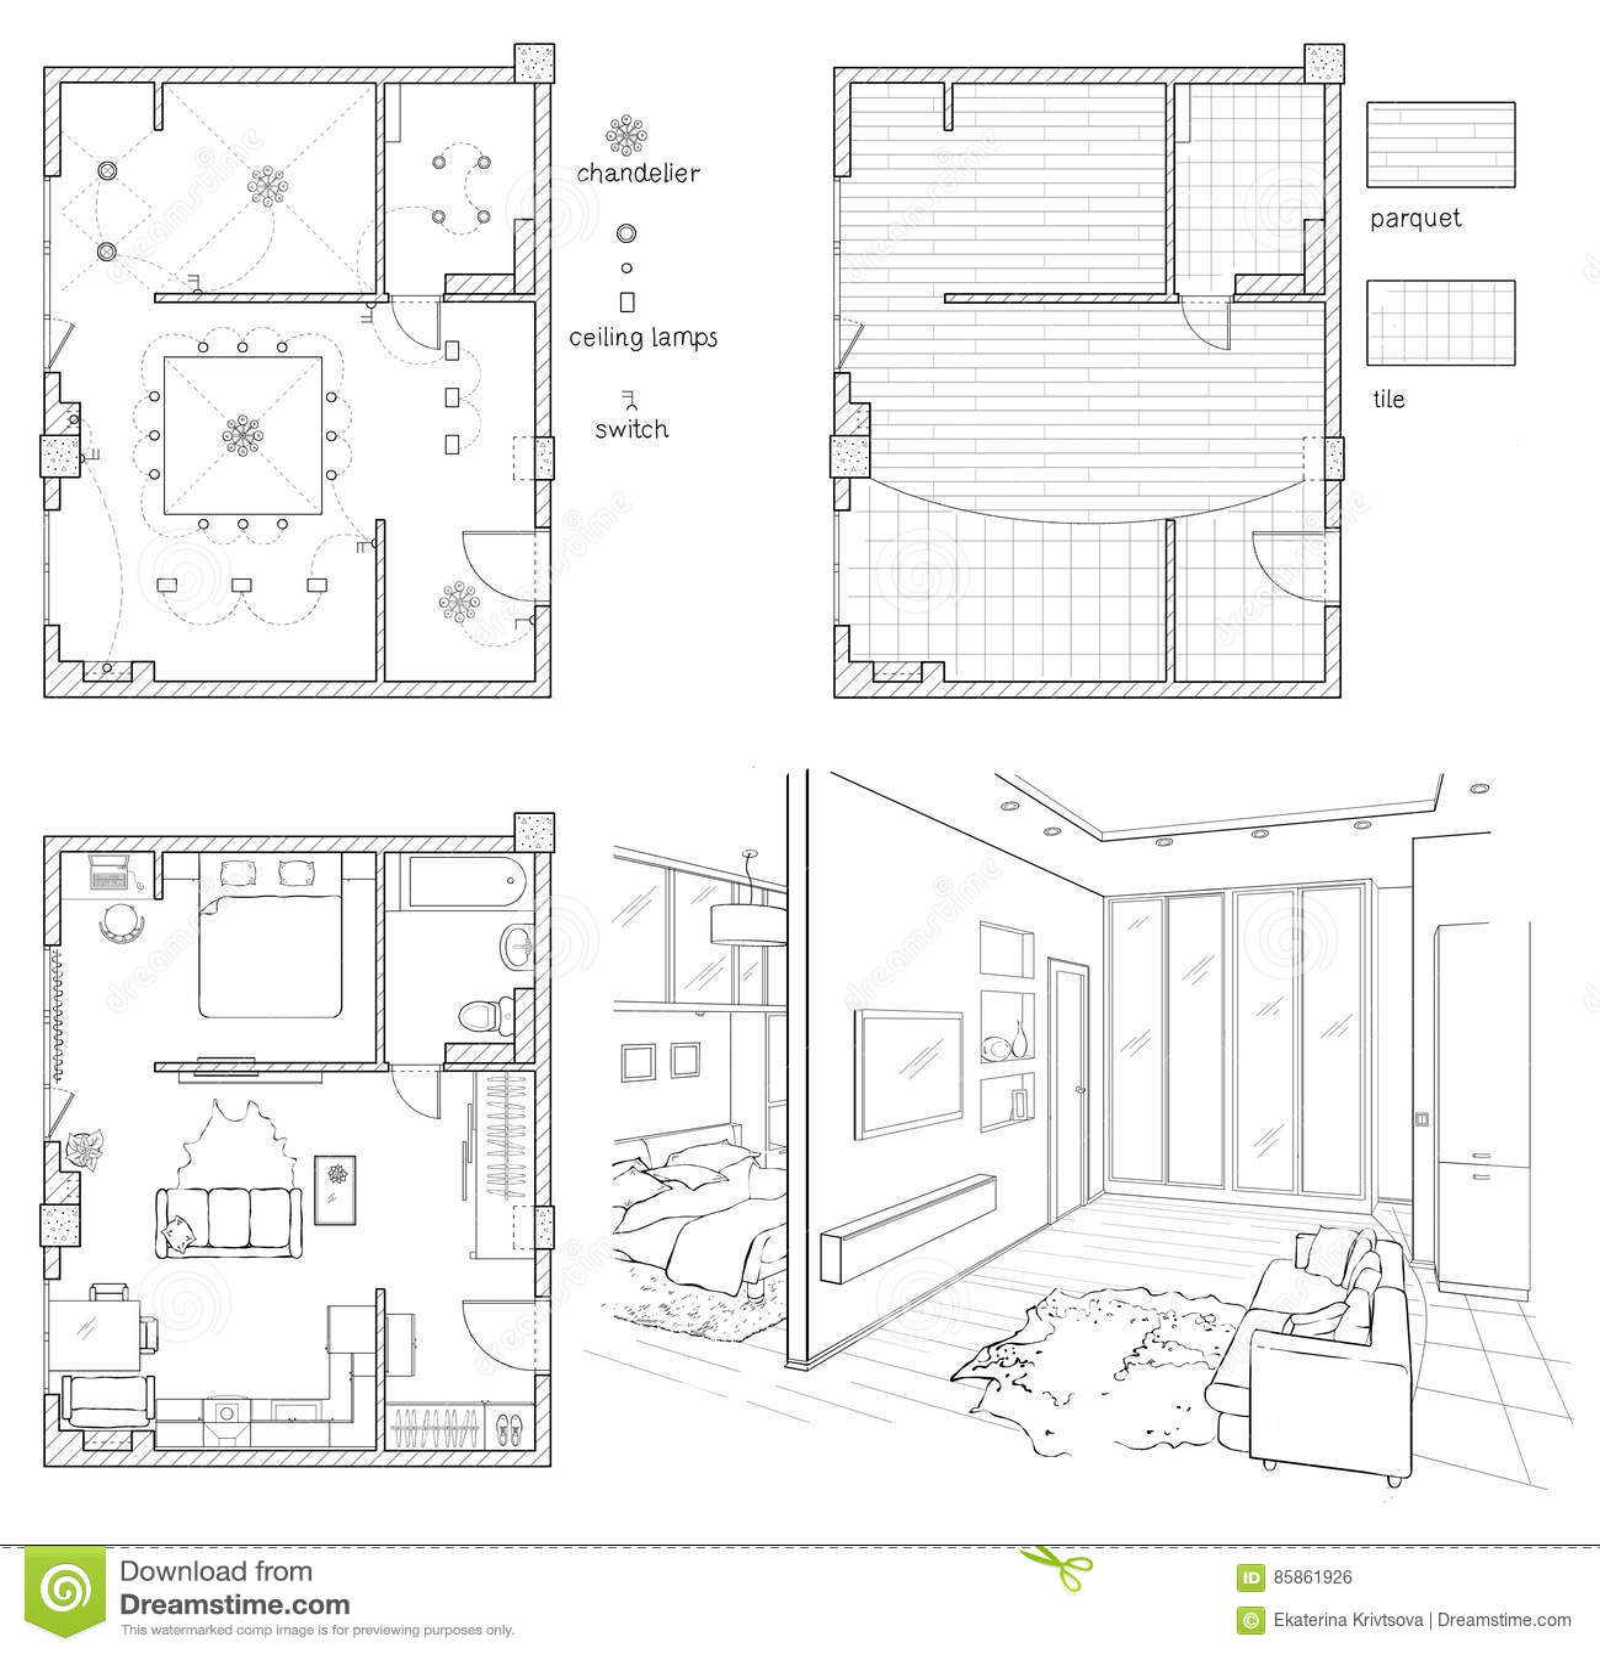 interior design floor plan sketches cafe digital illustration floor plan and room sketch illustration floor plan and room sketch stock